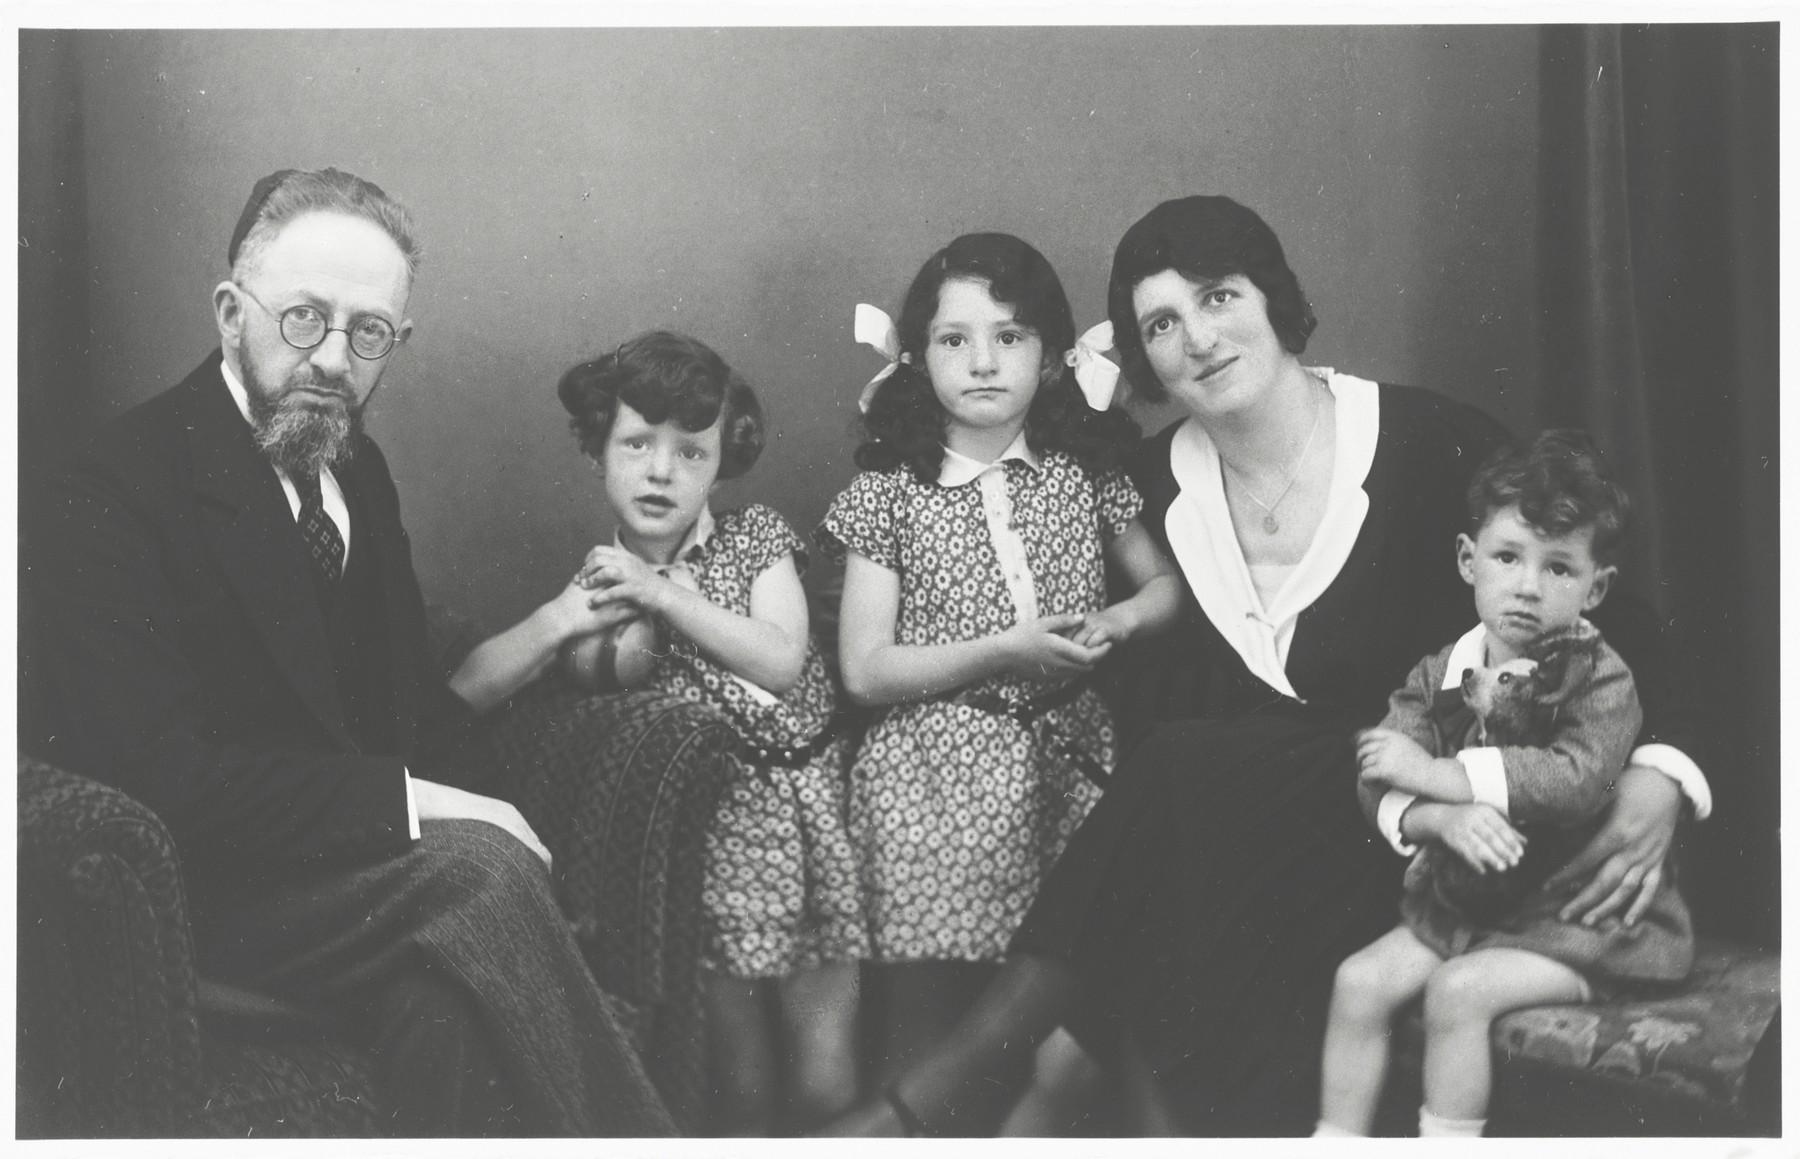 Portrait of the family of Rabbi Baruch Posner.  Pictured are Rabbi Posner, Shulamit, Gitta, Rosie and Avraham.